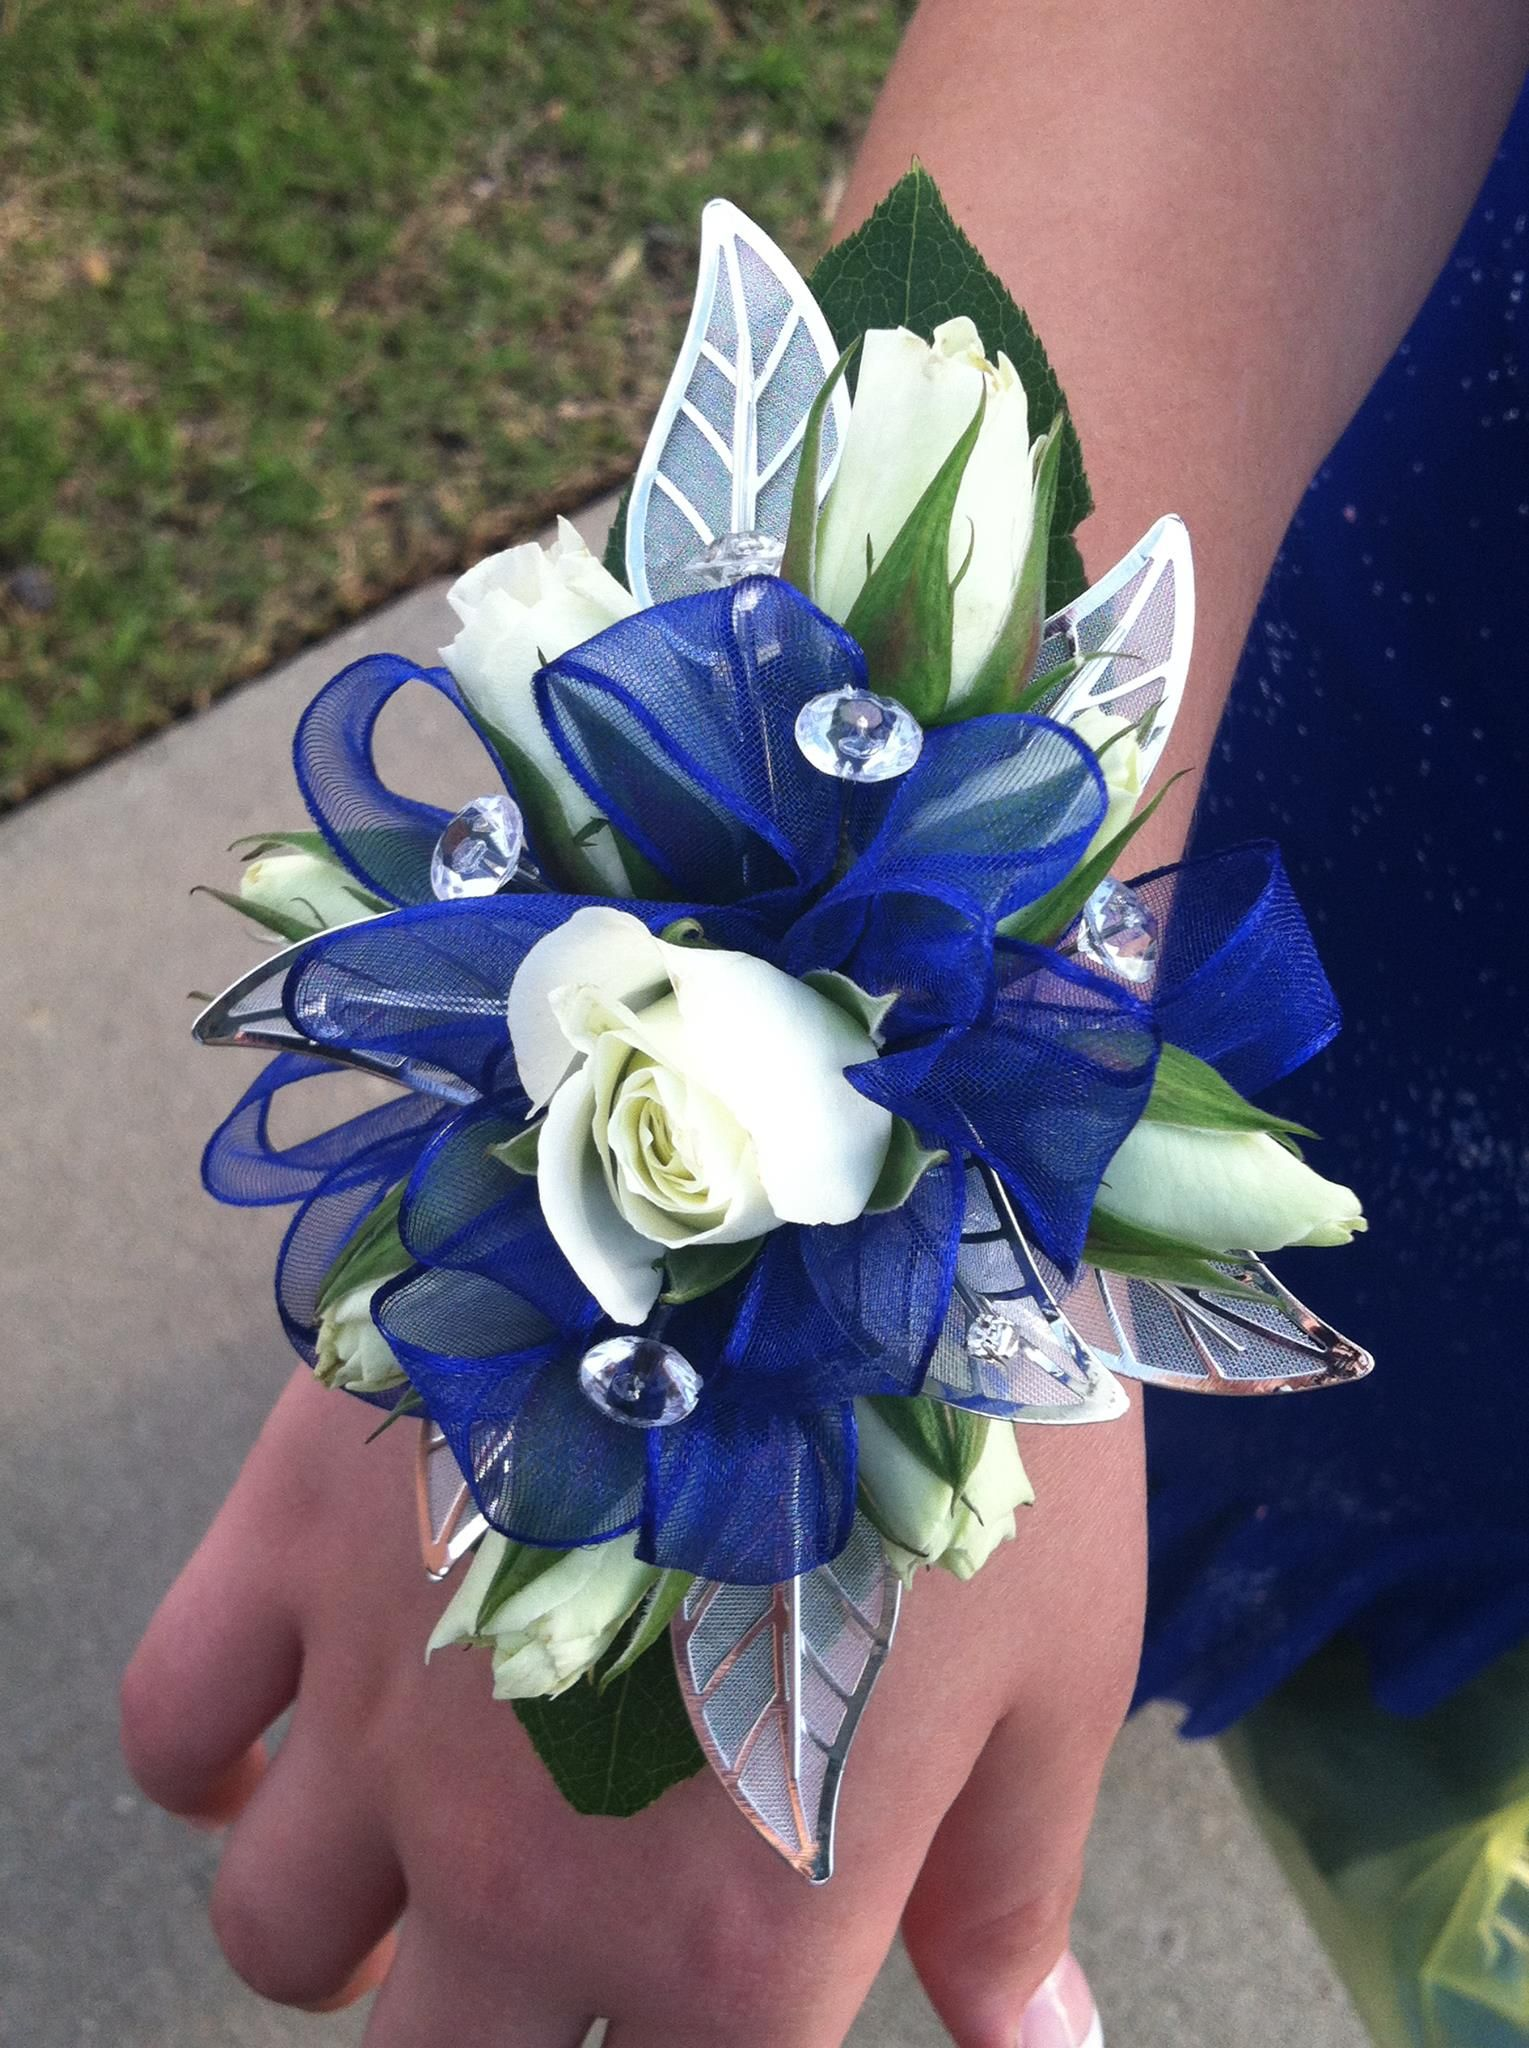 Blue and silver wrist corsage wrist corsage wedding